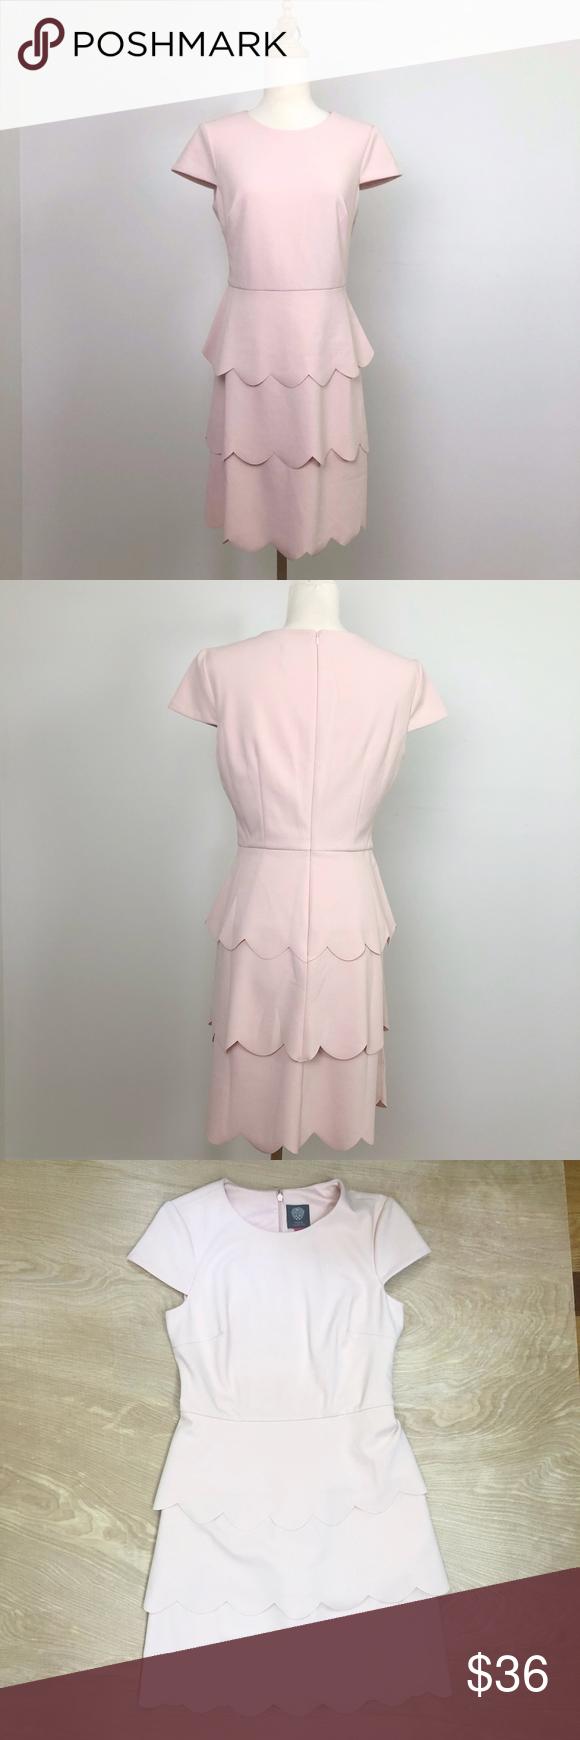 Vince Camuto Pink Dress W Scalloped Tiered Skirt Skirt Fashion Pink Dress Womens Dresses [ 1740 x 580 Pixel ]